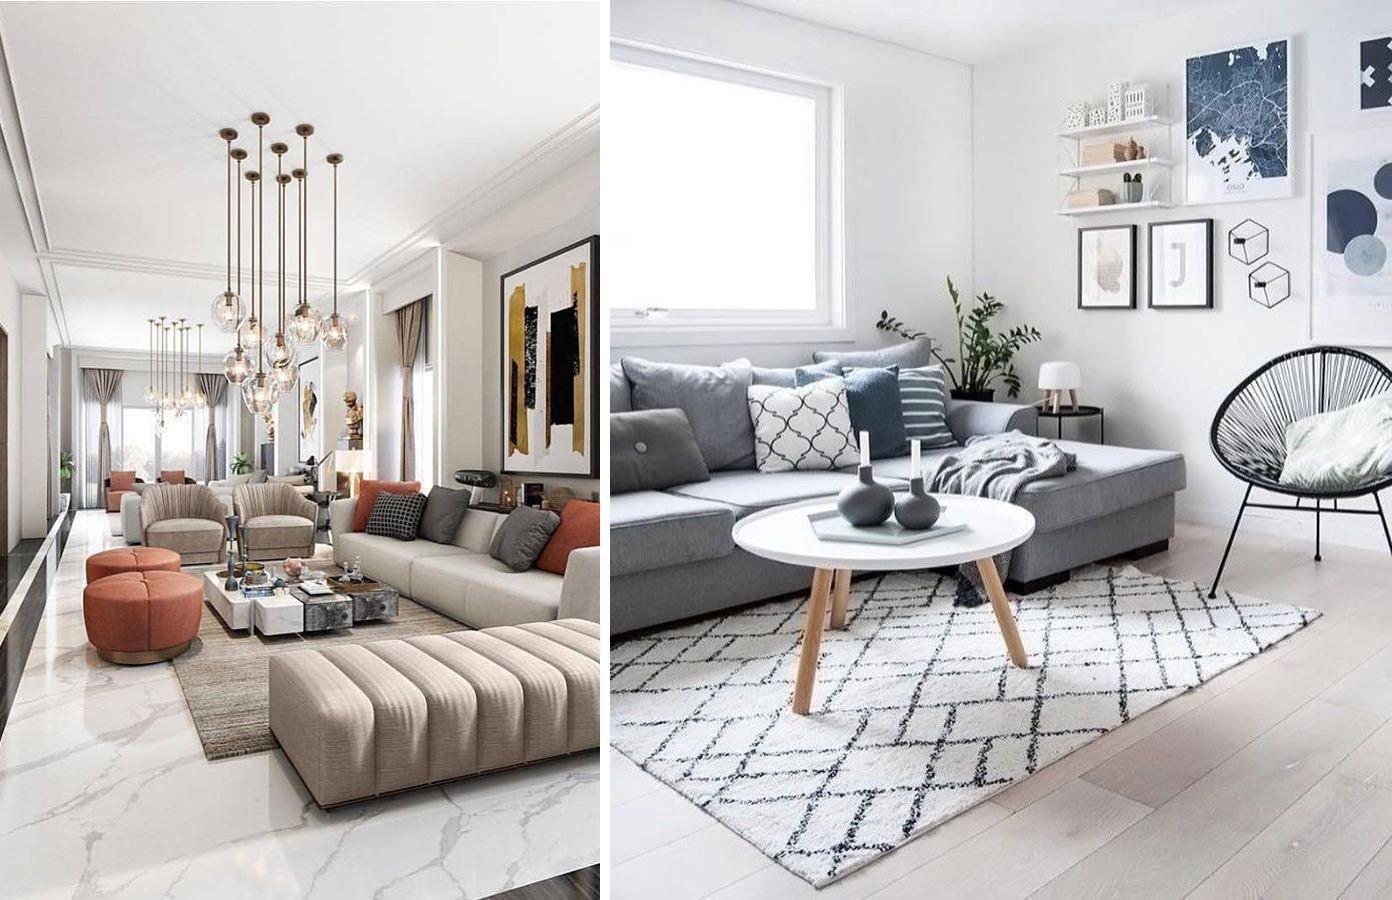 Living Area Design Best Drawing Room Designs Latest Sitting Room Design Living Room Decor Sitting Room Design Living Room Drawing room decoration images